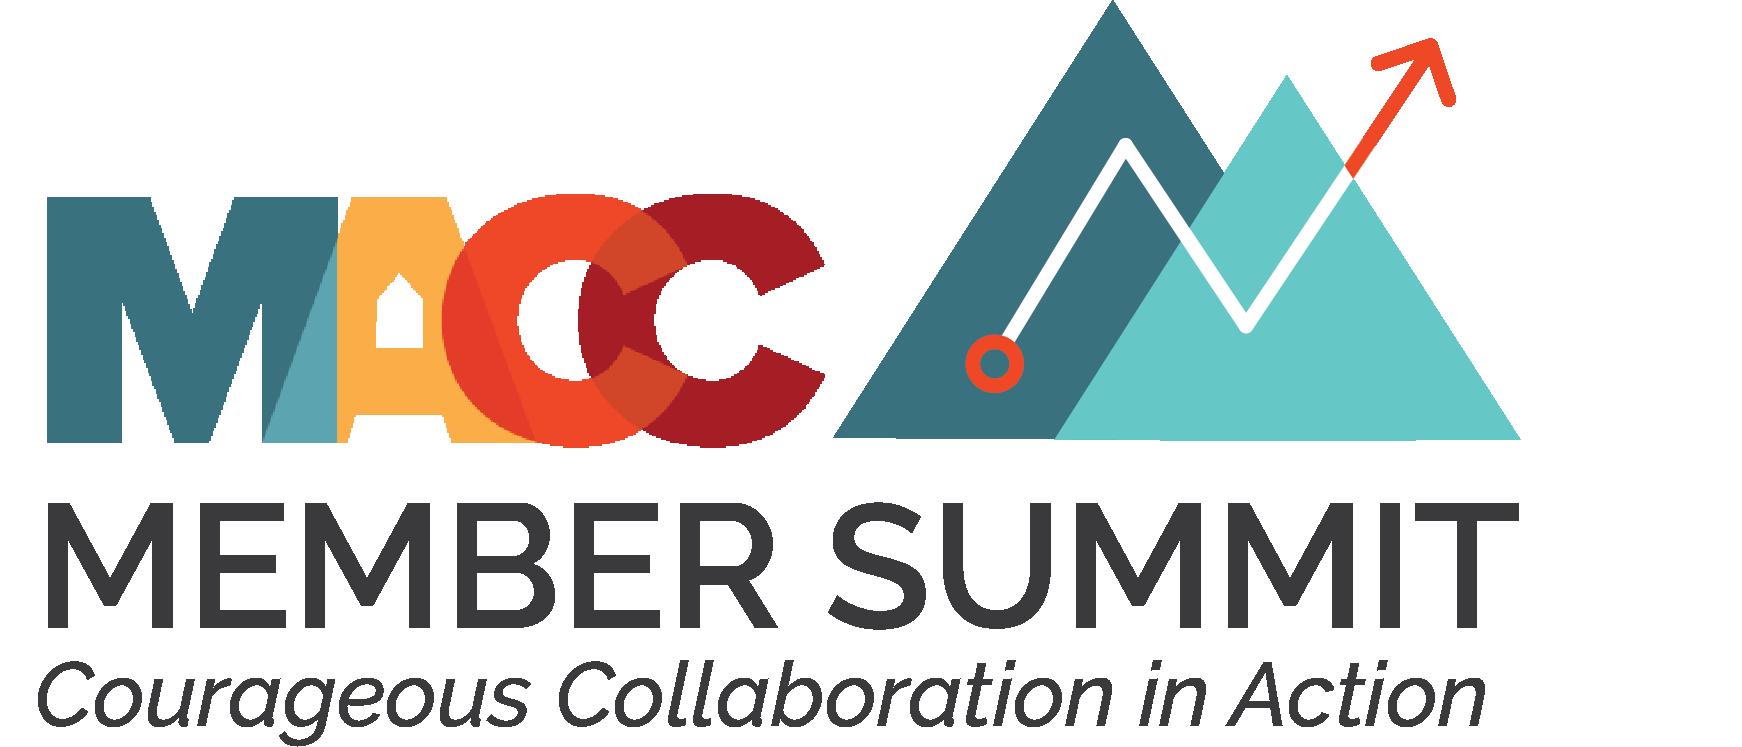 Member Summit